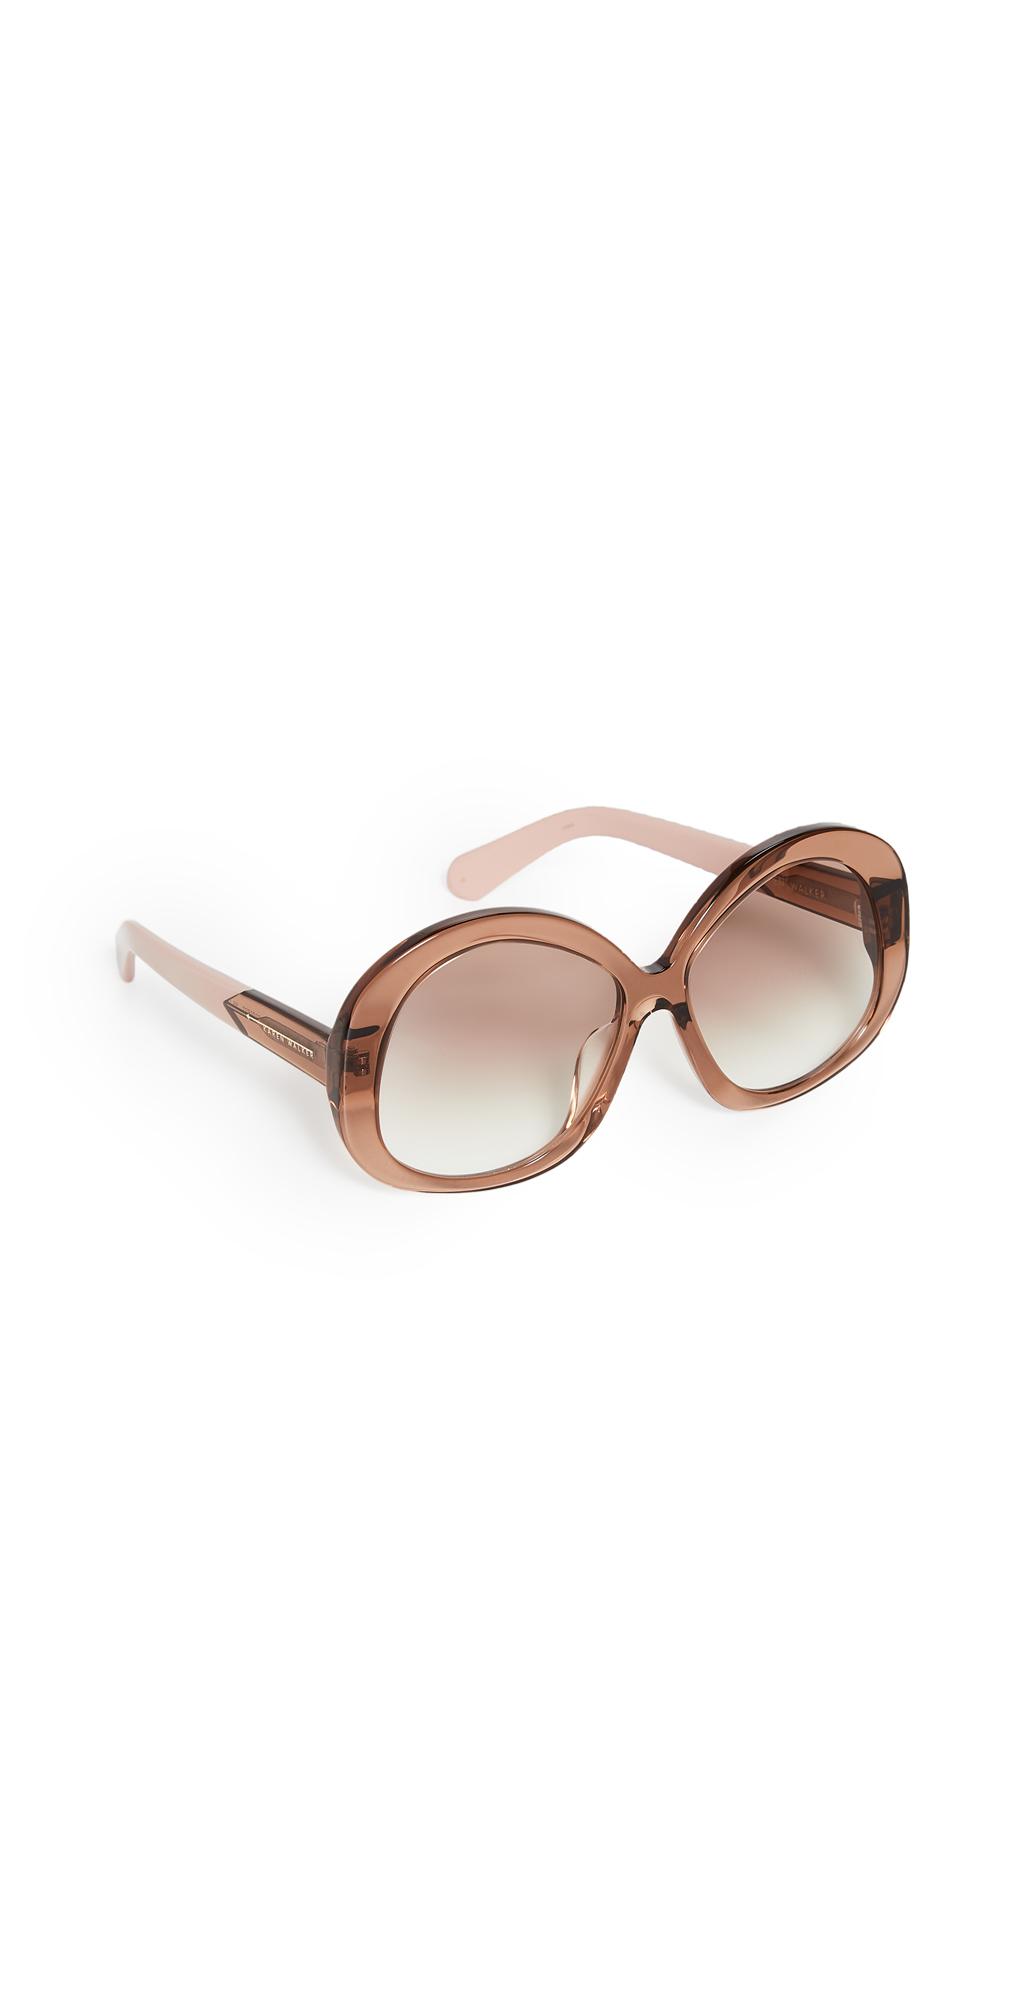 Supersonic Sunglasses